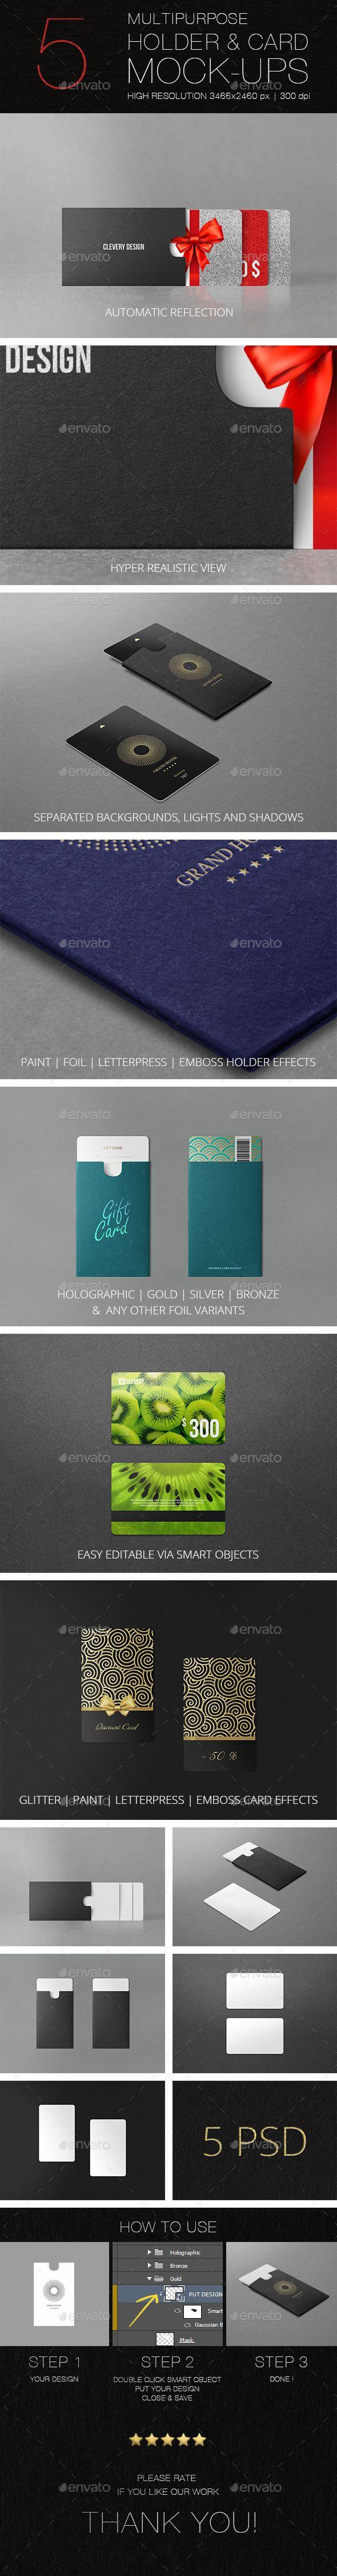 Multipurpose Holder & Card Mockup. Download here: https://graphicriver.net/item/multipurpose-holder-card-mockup-vol-10/17367689?ref=ksioks